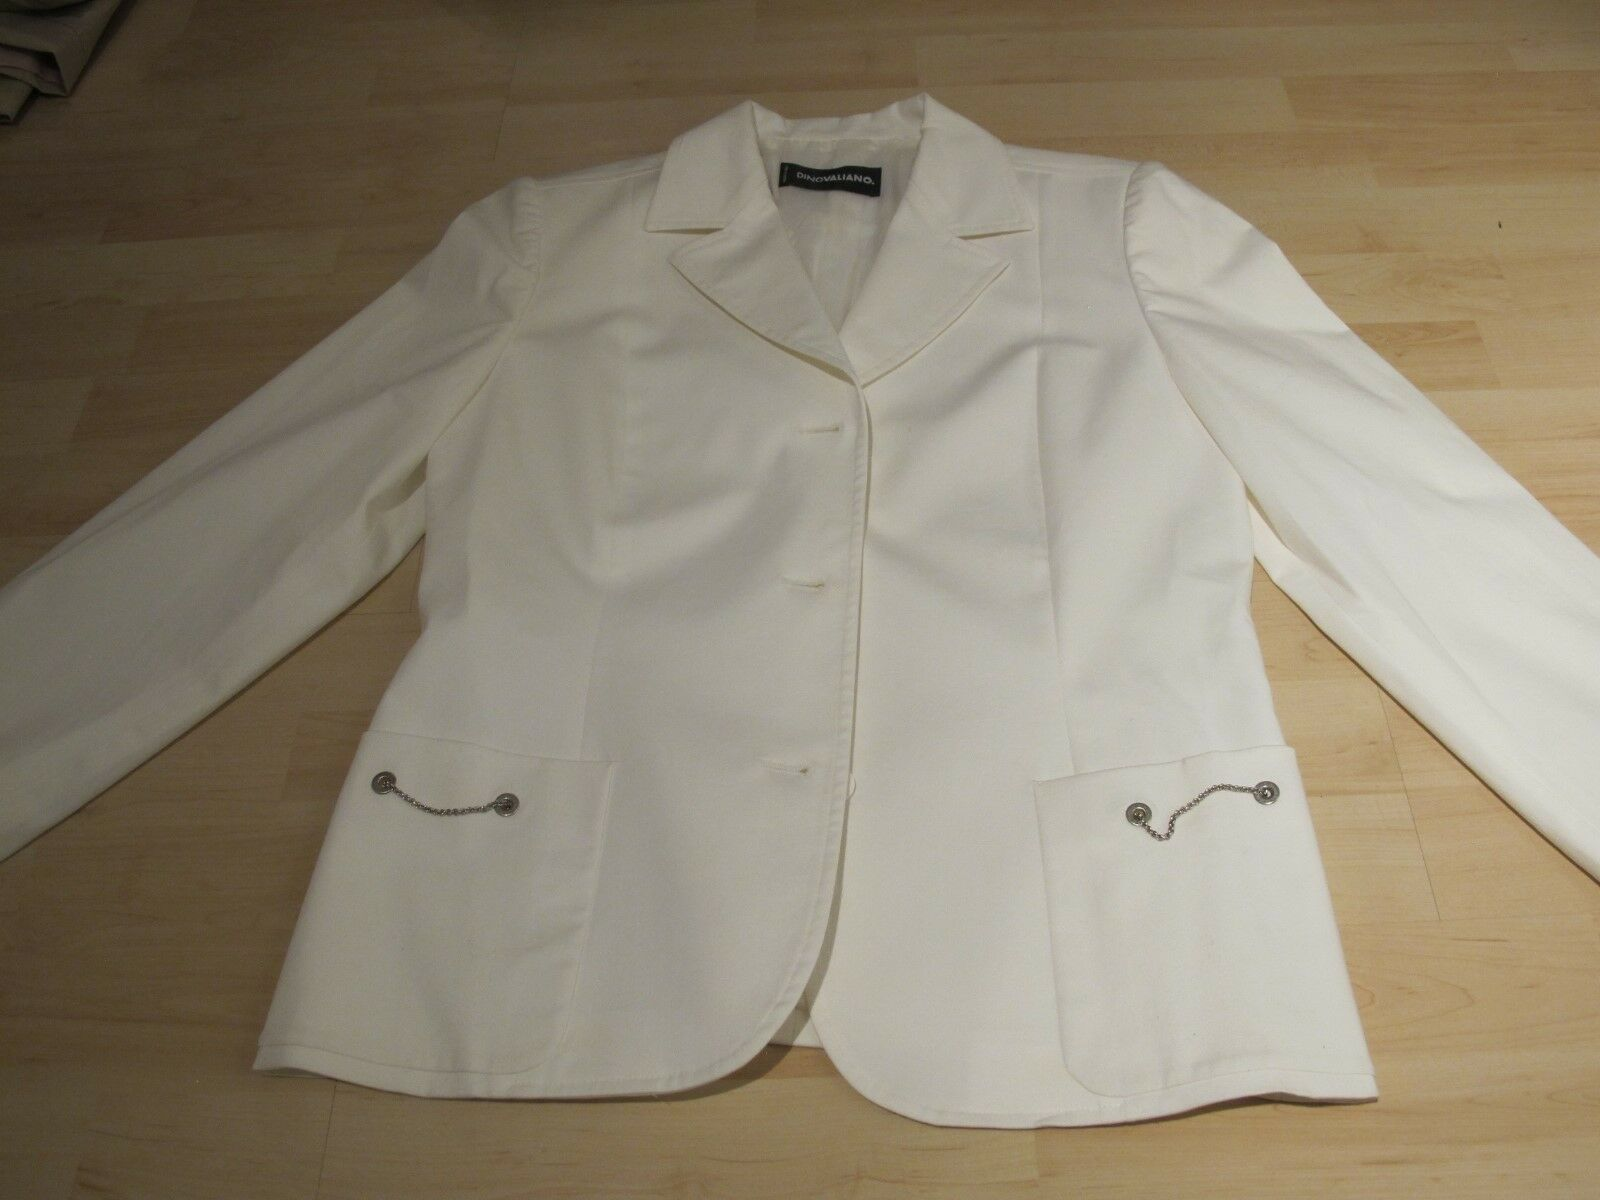 Dino Valiano * Blazer Jacket * White * Size 38 * Top